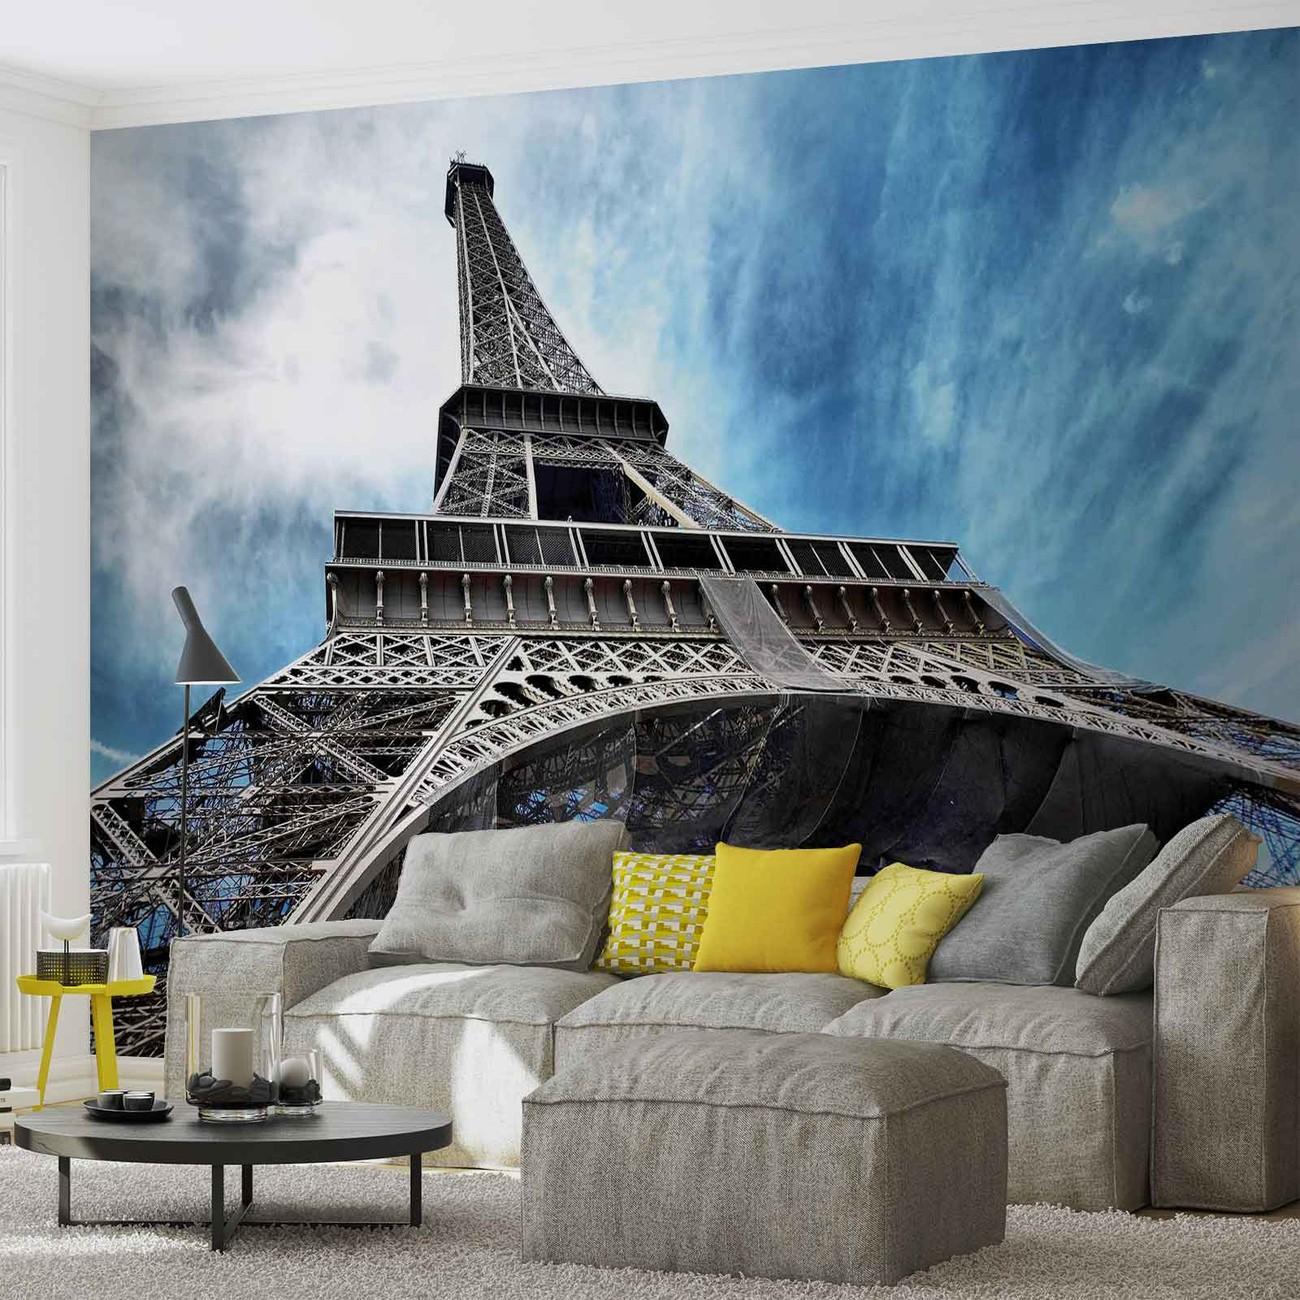 Eiffel tower paris wall paper mural buy at europosters for Eiffel tower wallpaper mural